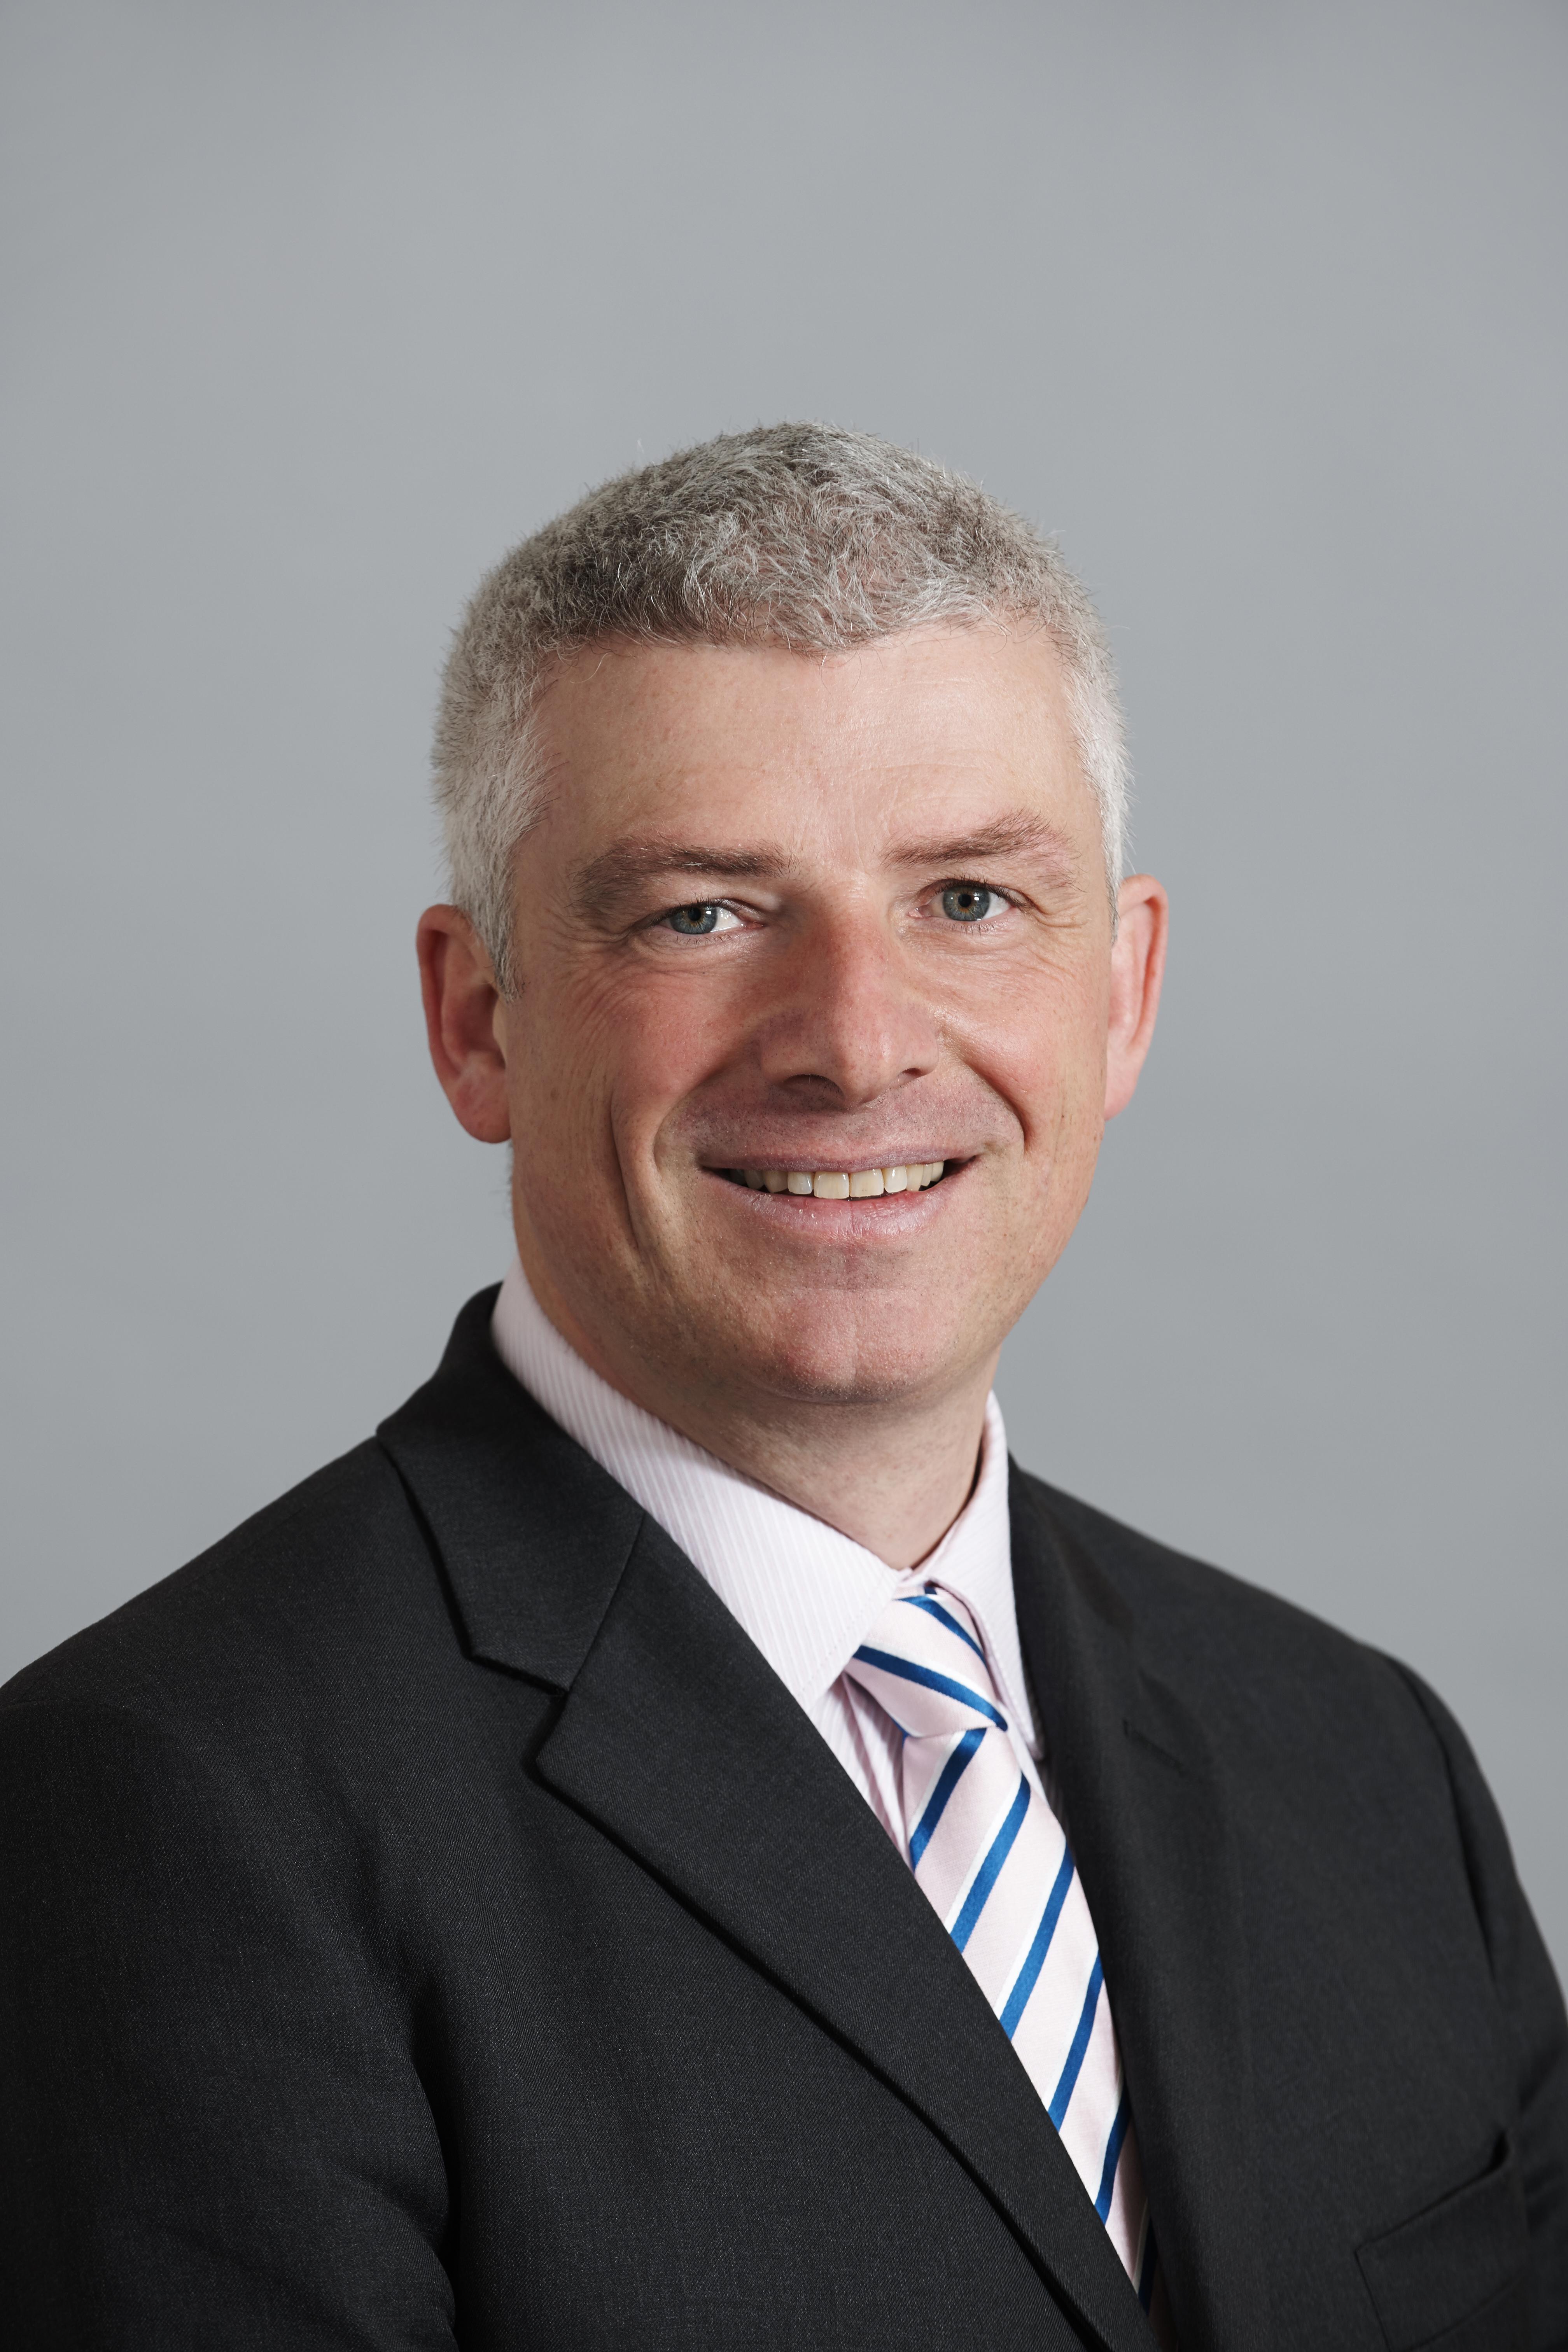 Neil Piper